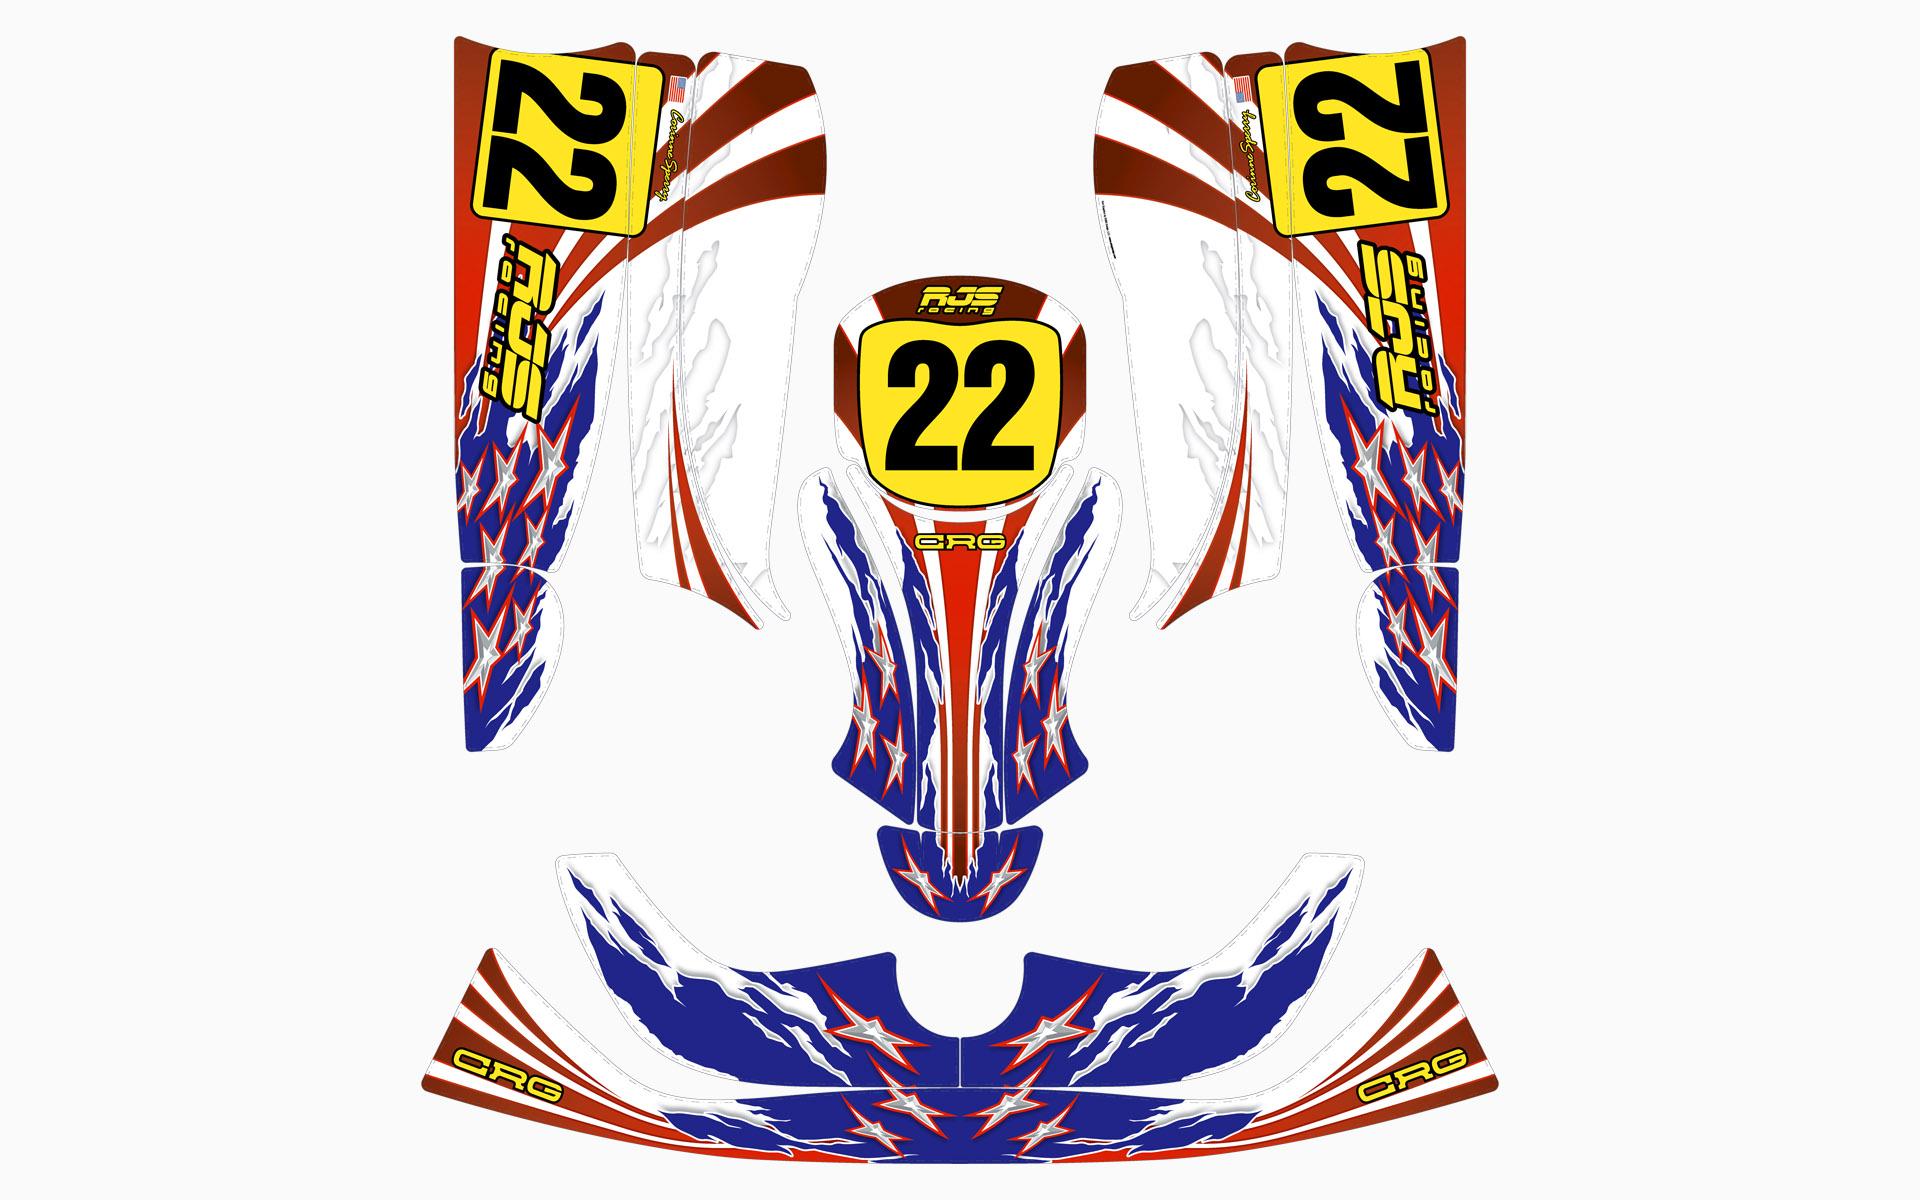 RJS Racing CRG Kart Decal Kit